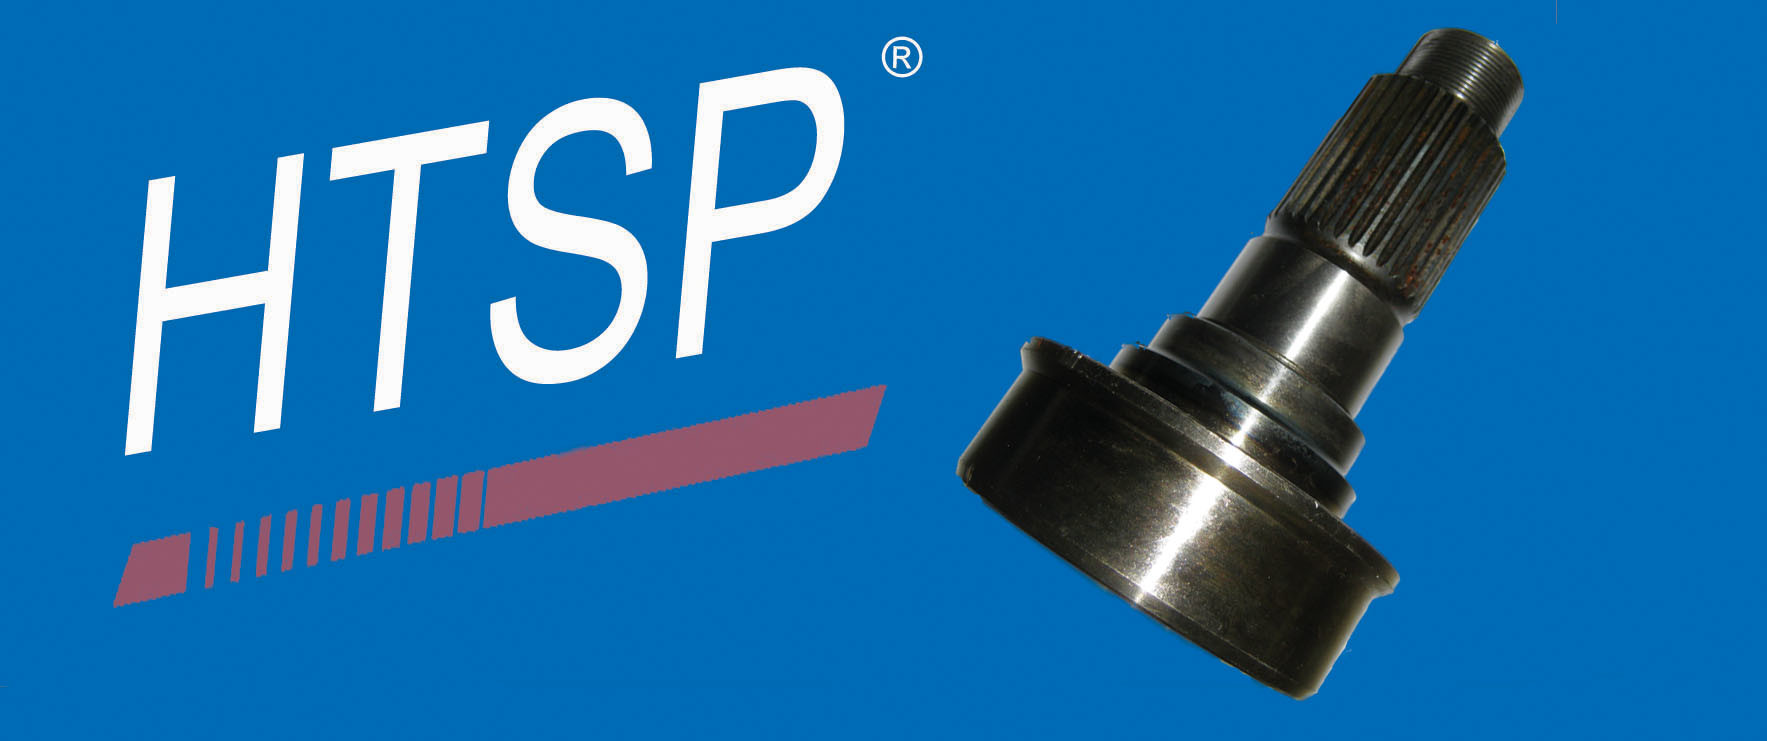 Spl250 Stub Shaft 250-53-11 for Drive Shaft